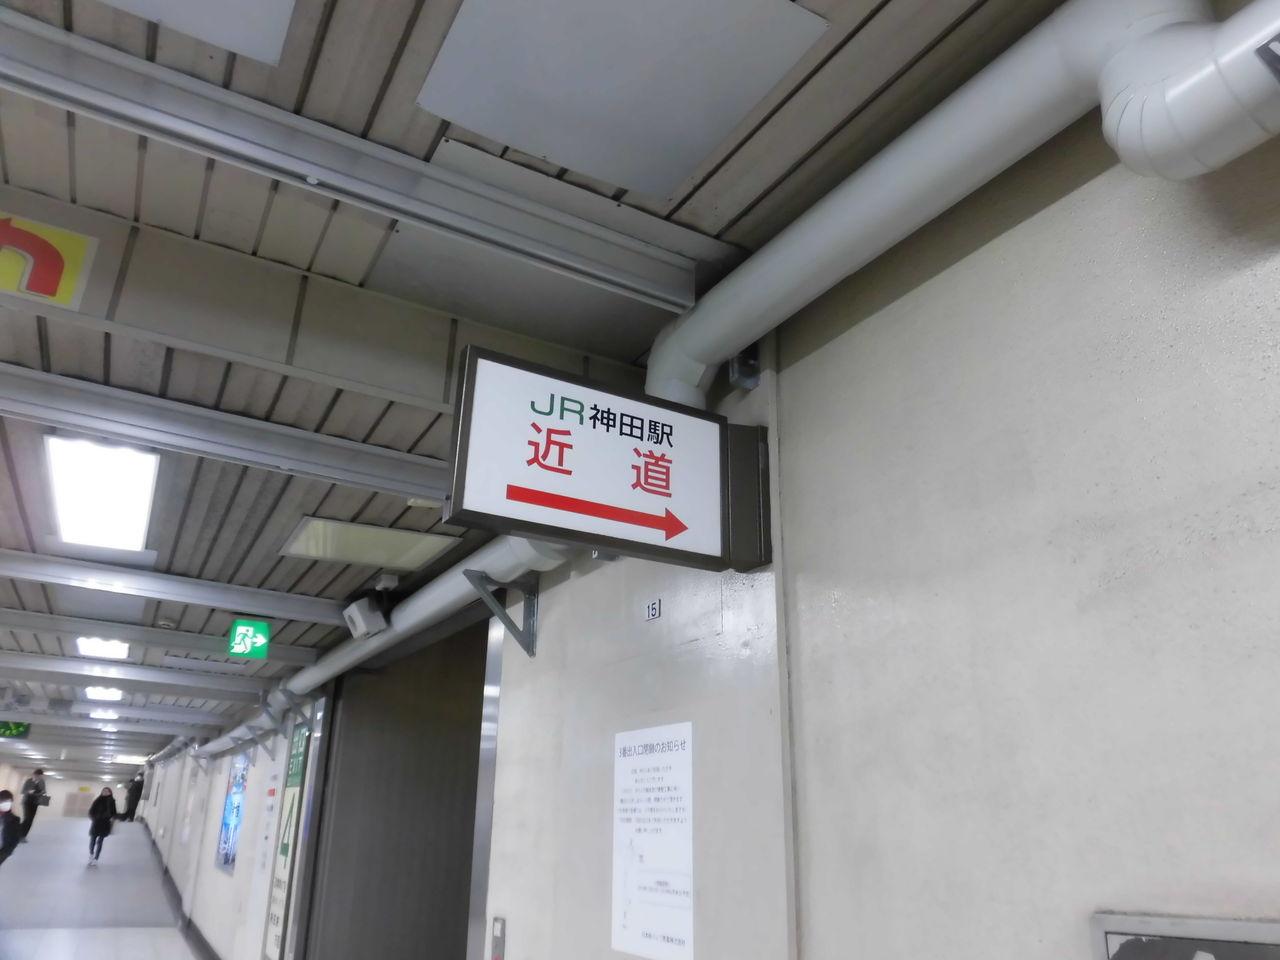 JR新日本橋駅